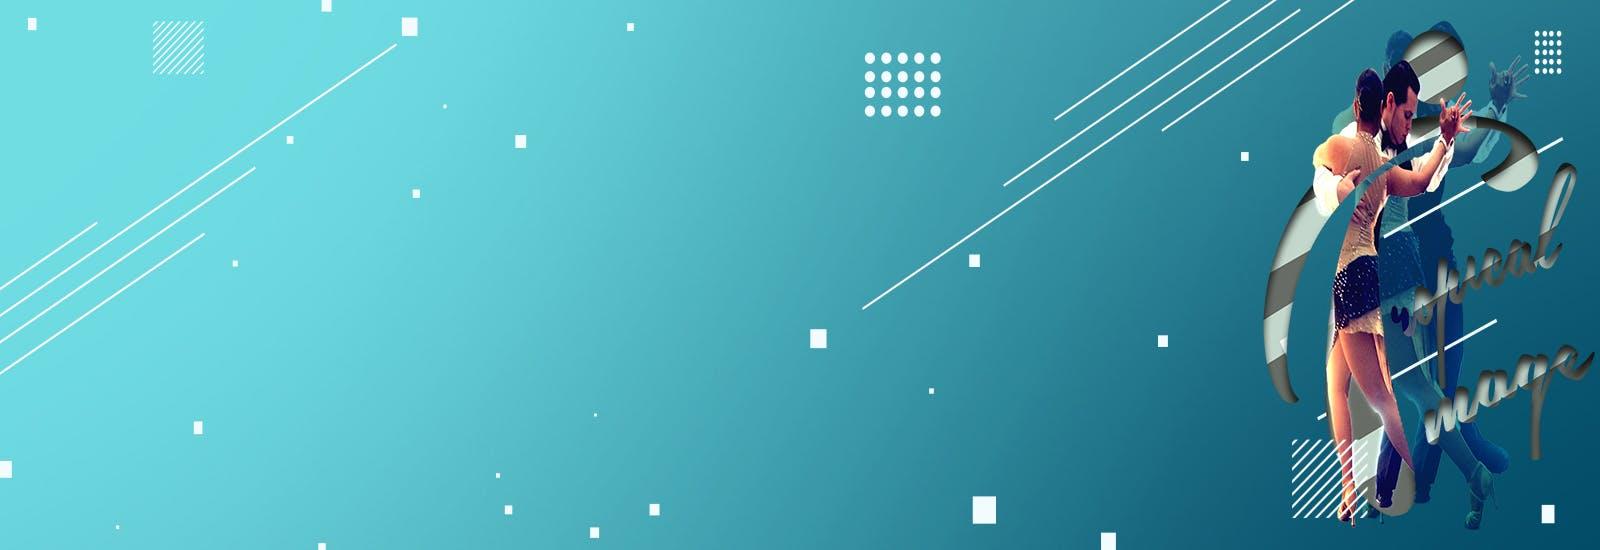 F7dae6e4d64785659455921c8f9dba1e625167b0 new web banner 1600 x 550